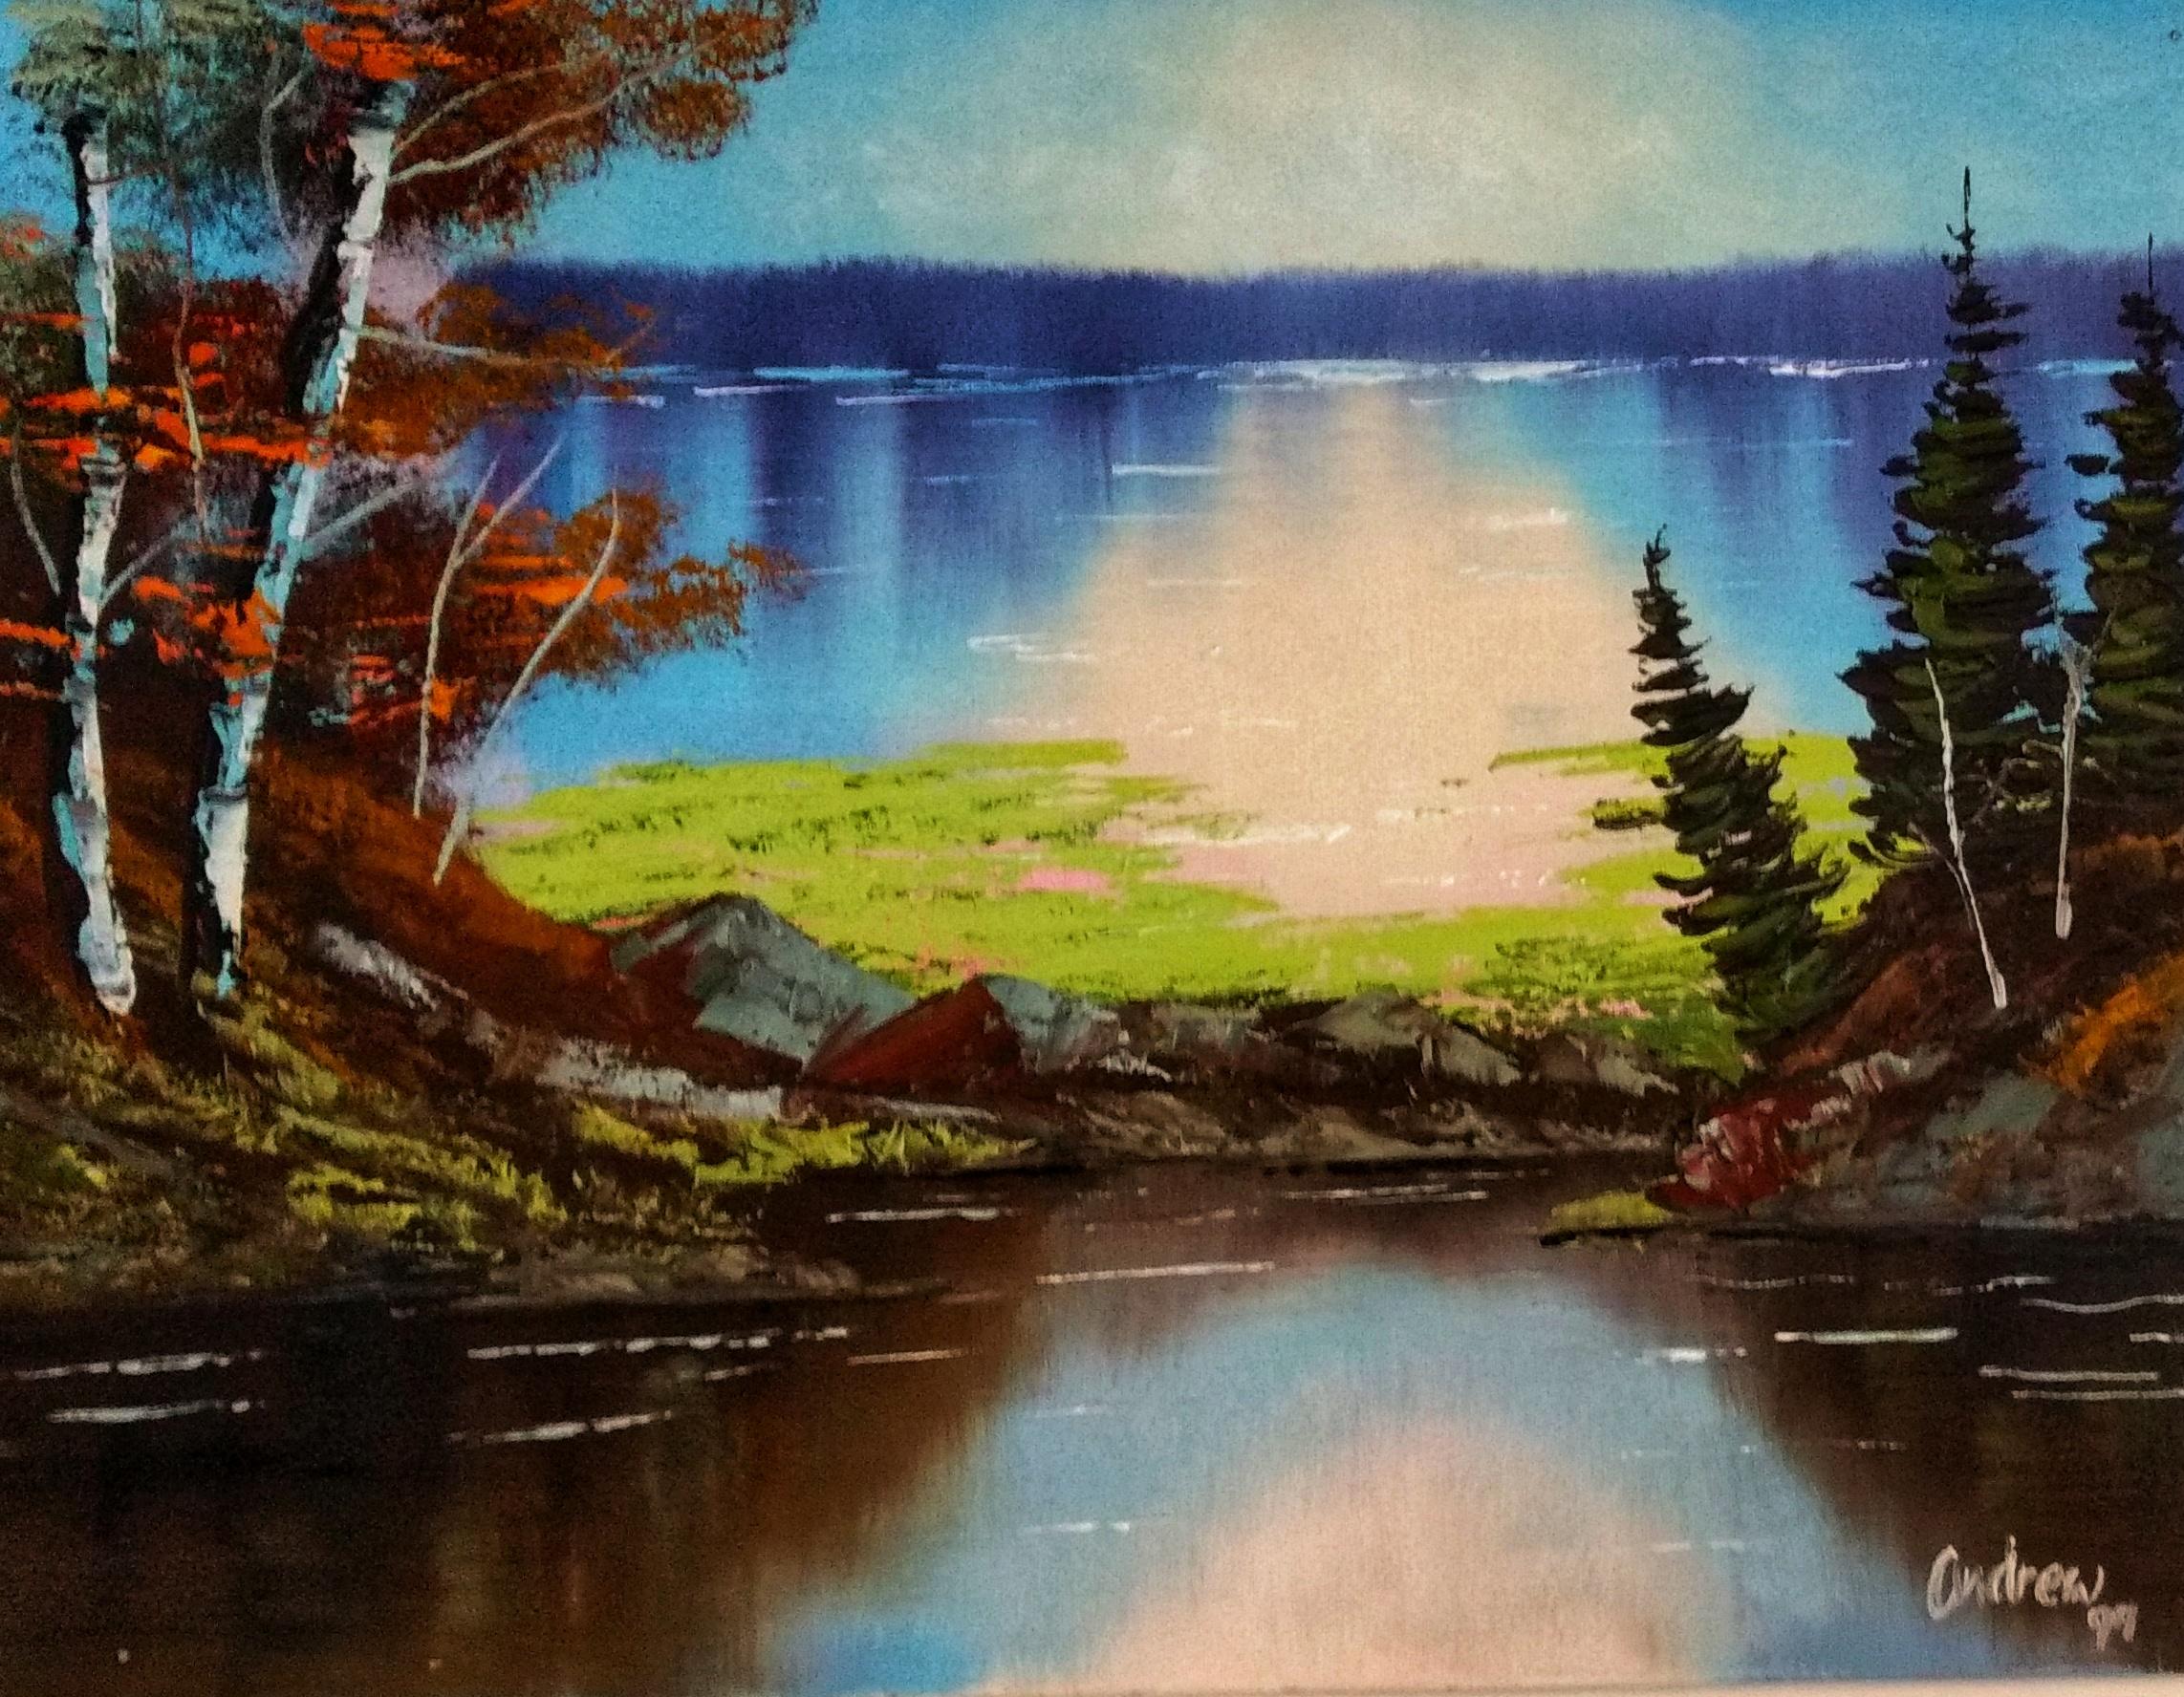 Landscape 2 - Oil